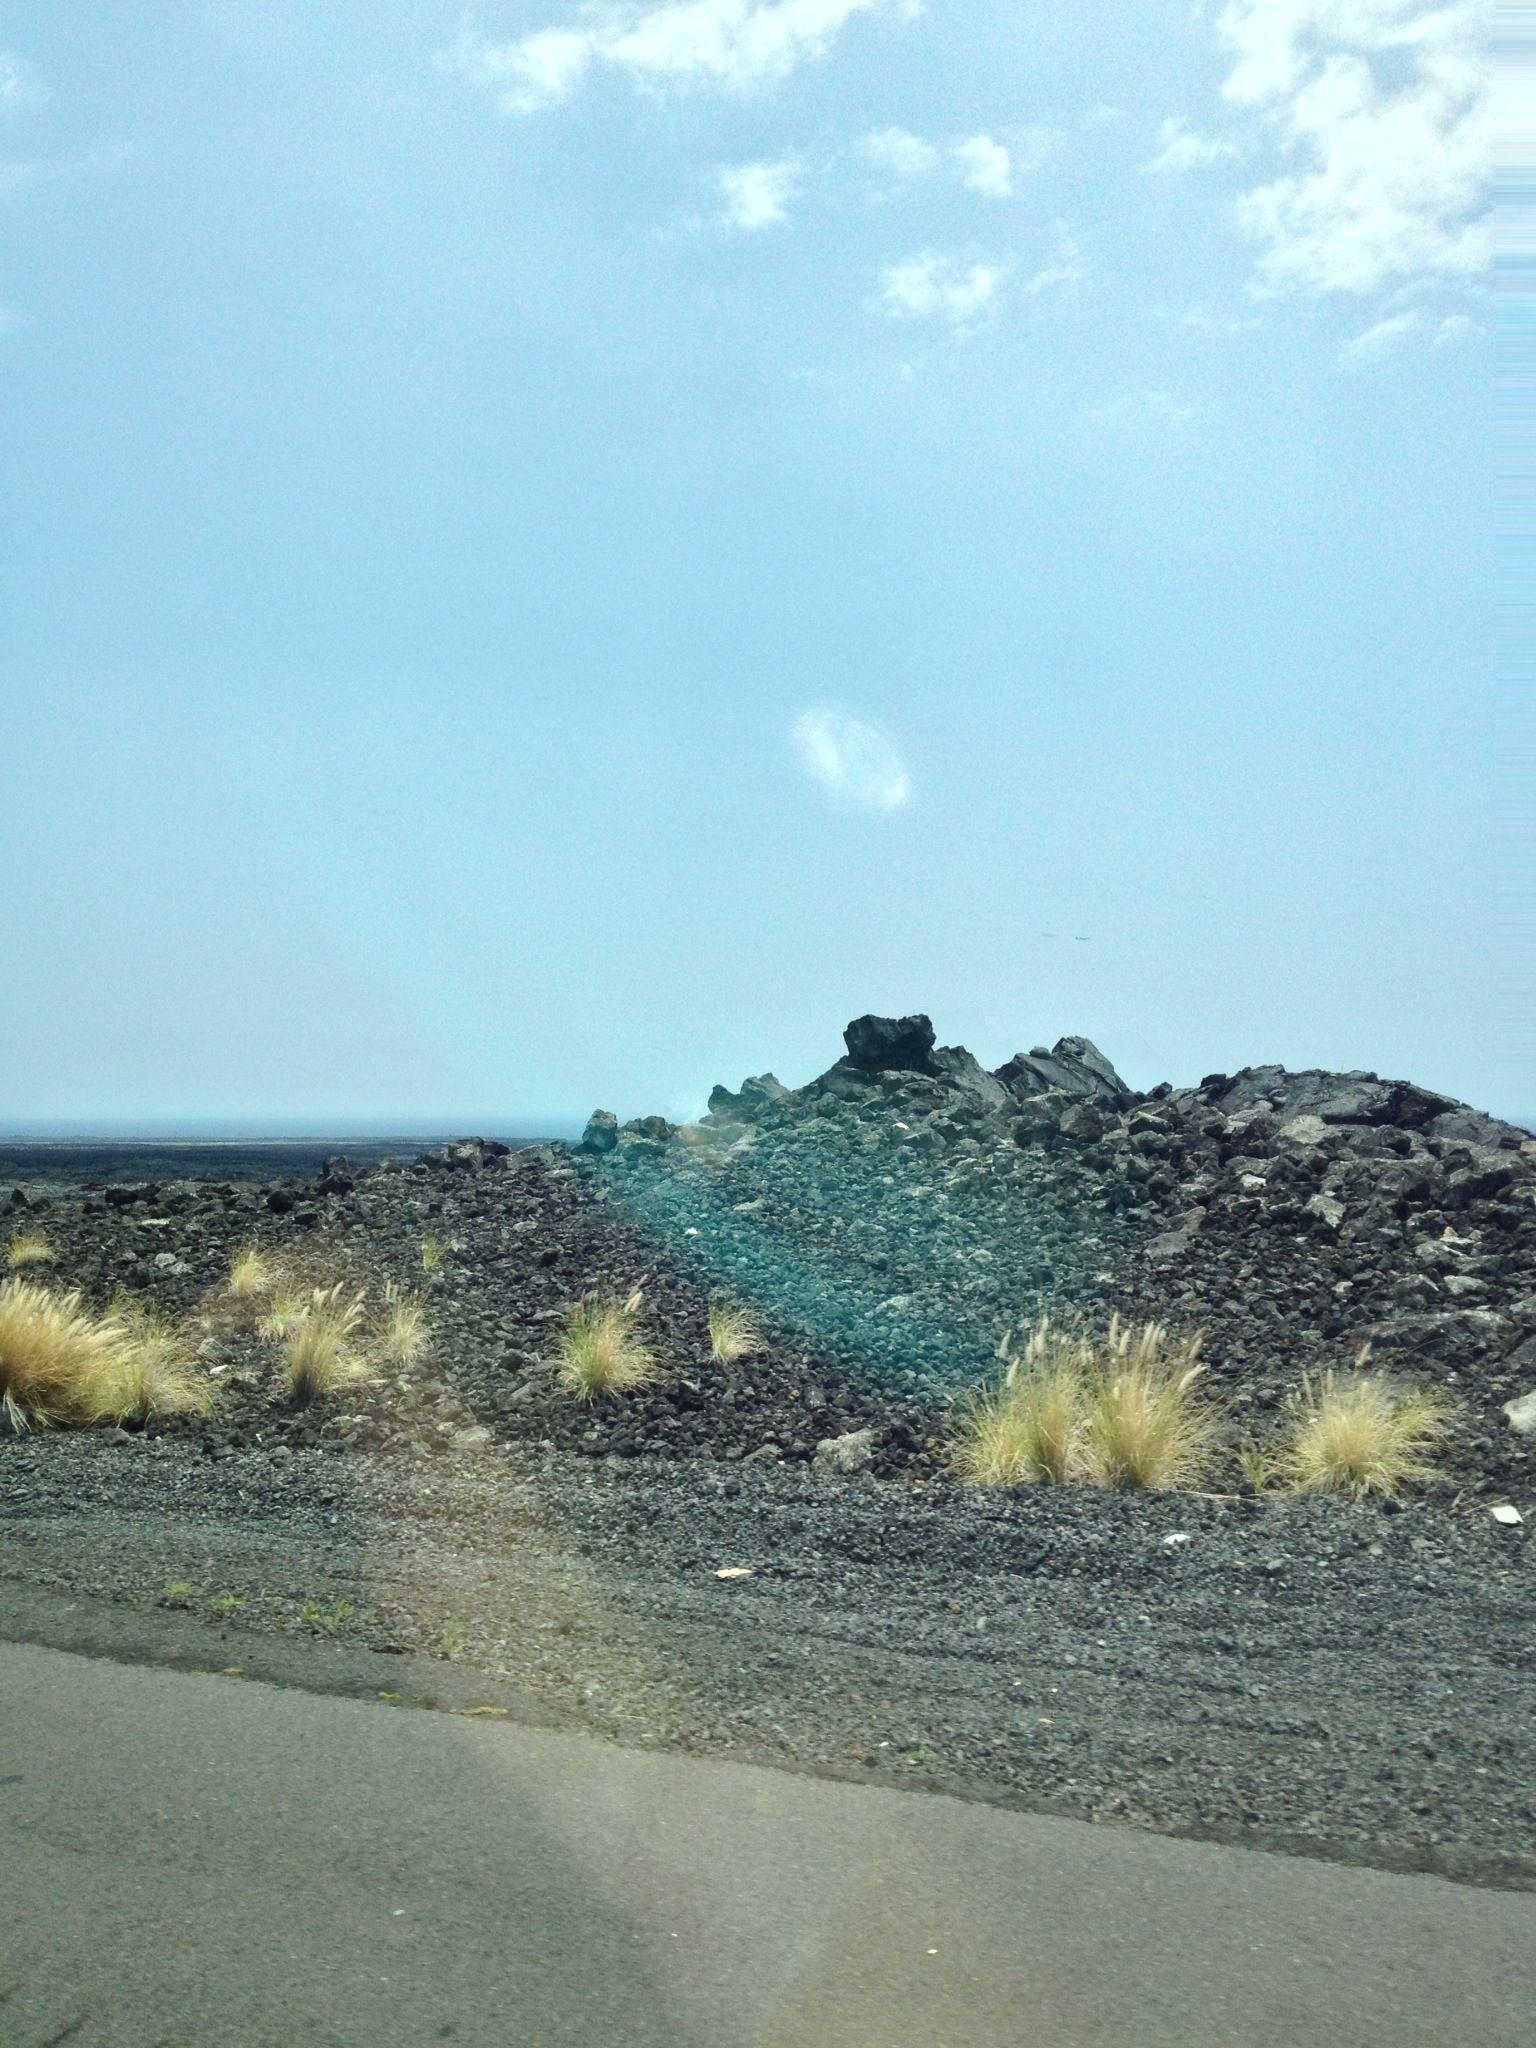 Lava surrounding the highway in Hawaii Big Island, Kona